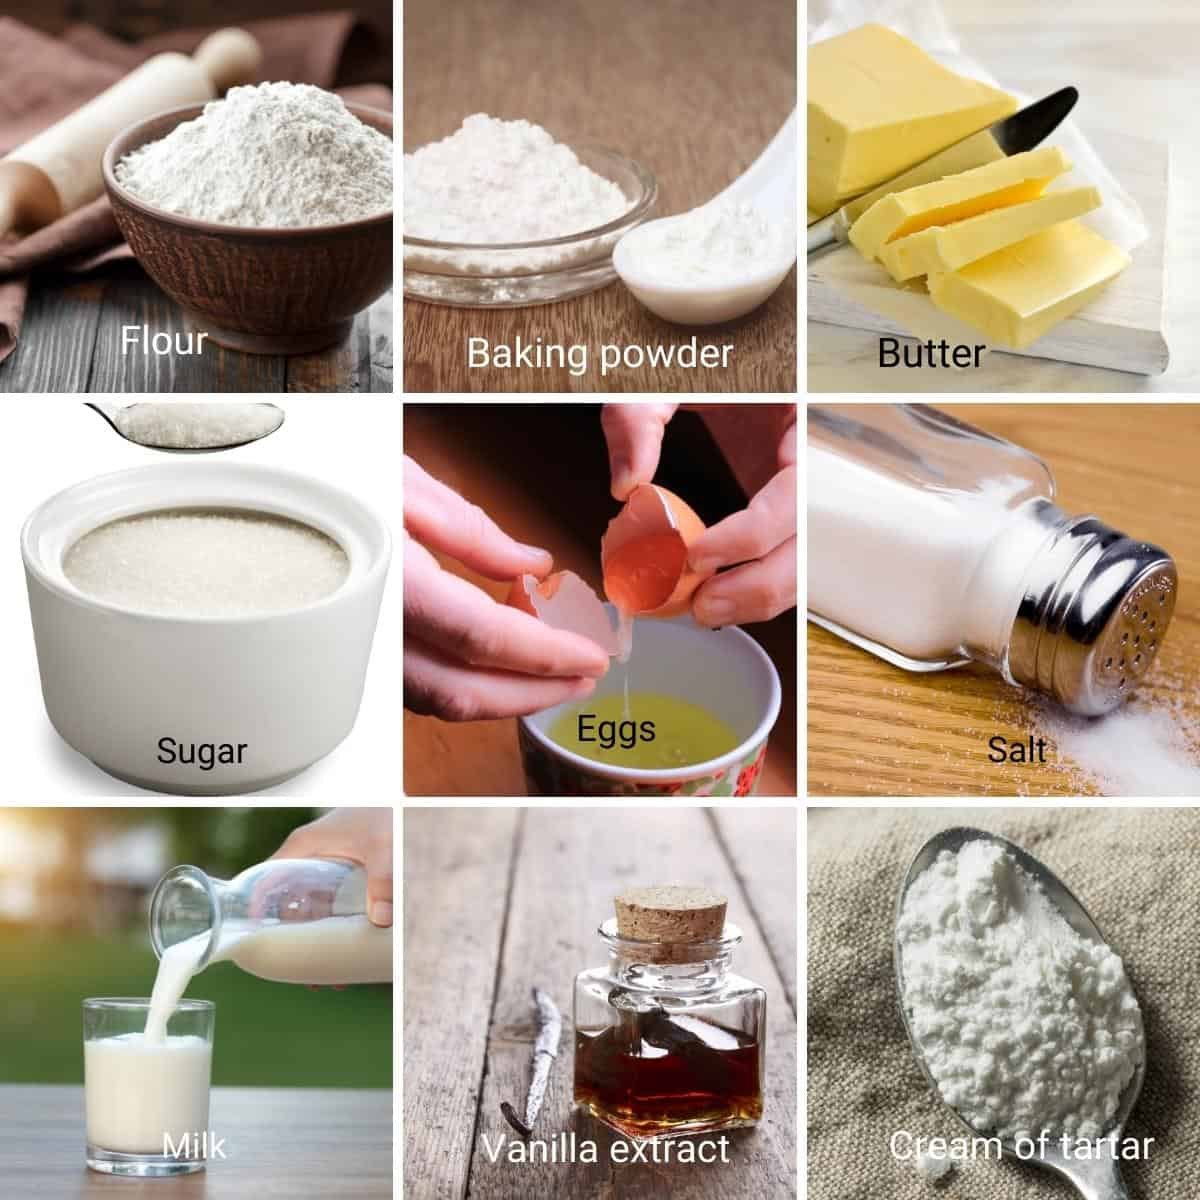 Ingredients for fluffy vanilla cake.